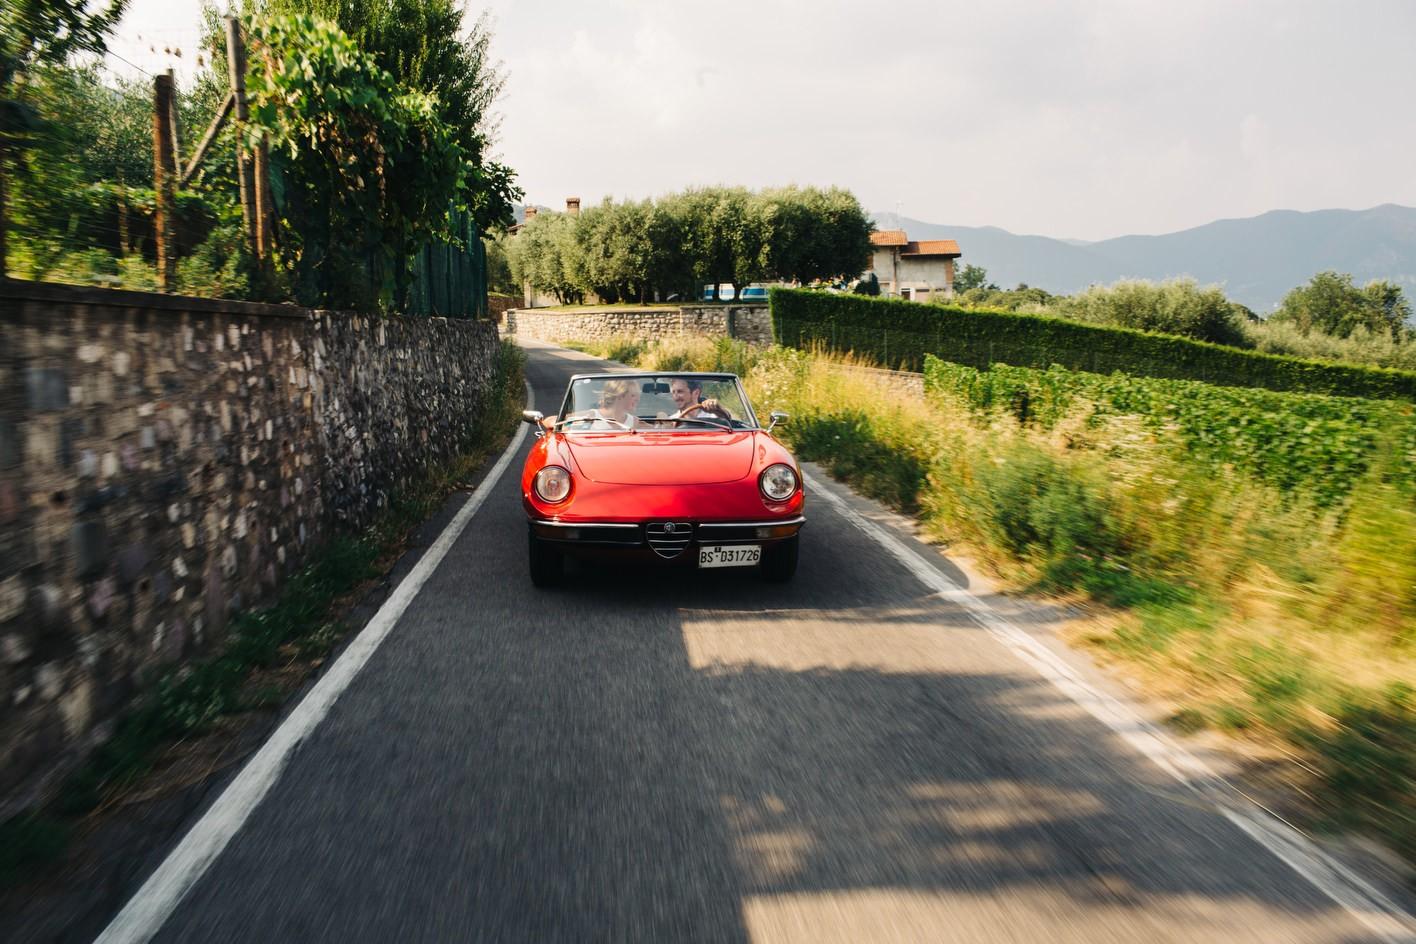 Italy destination wedding with vintage car